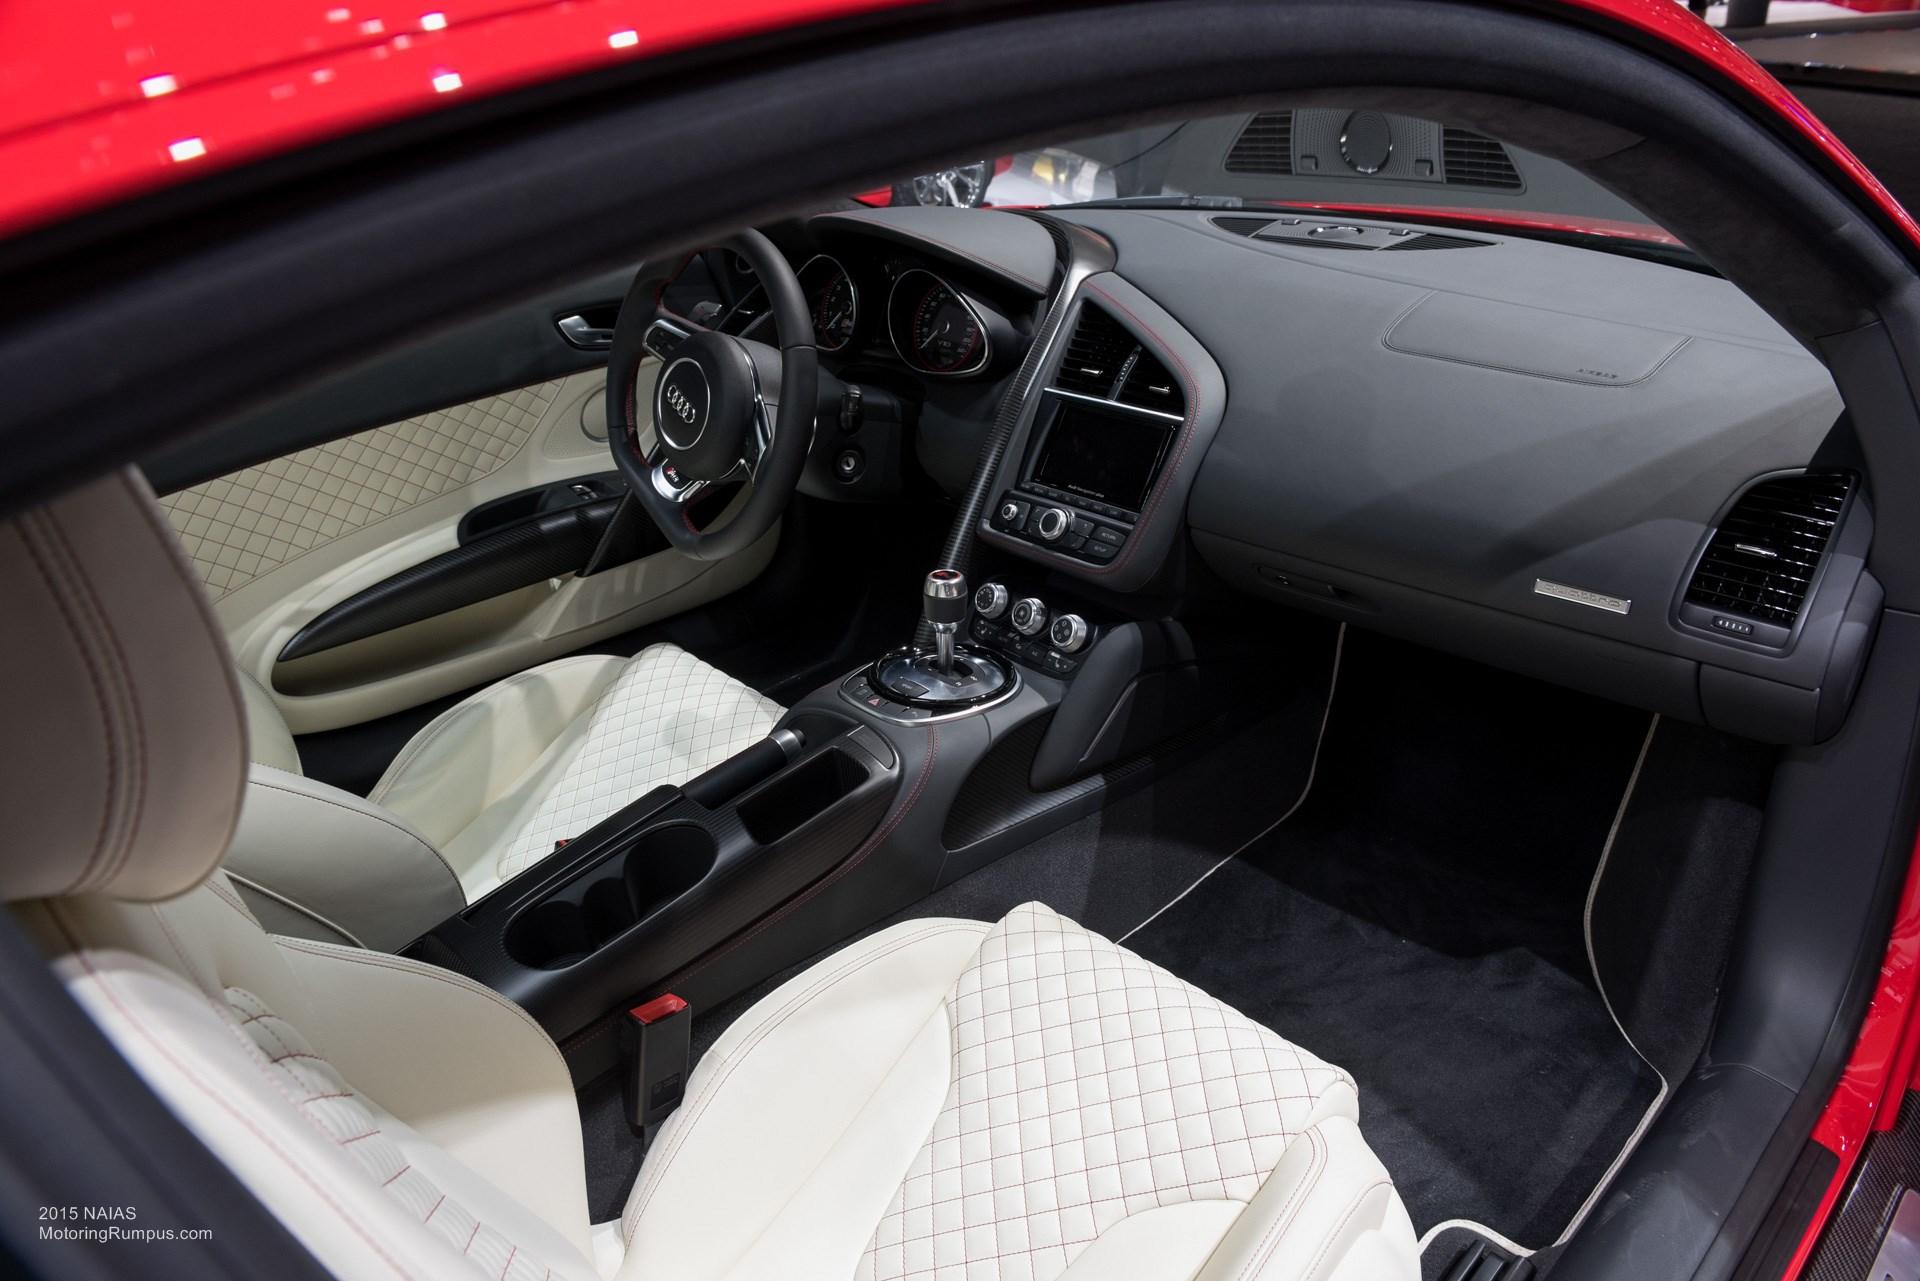 2015 NAIAS Audi R8 Seats